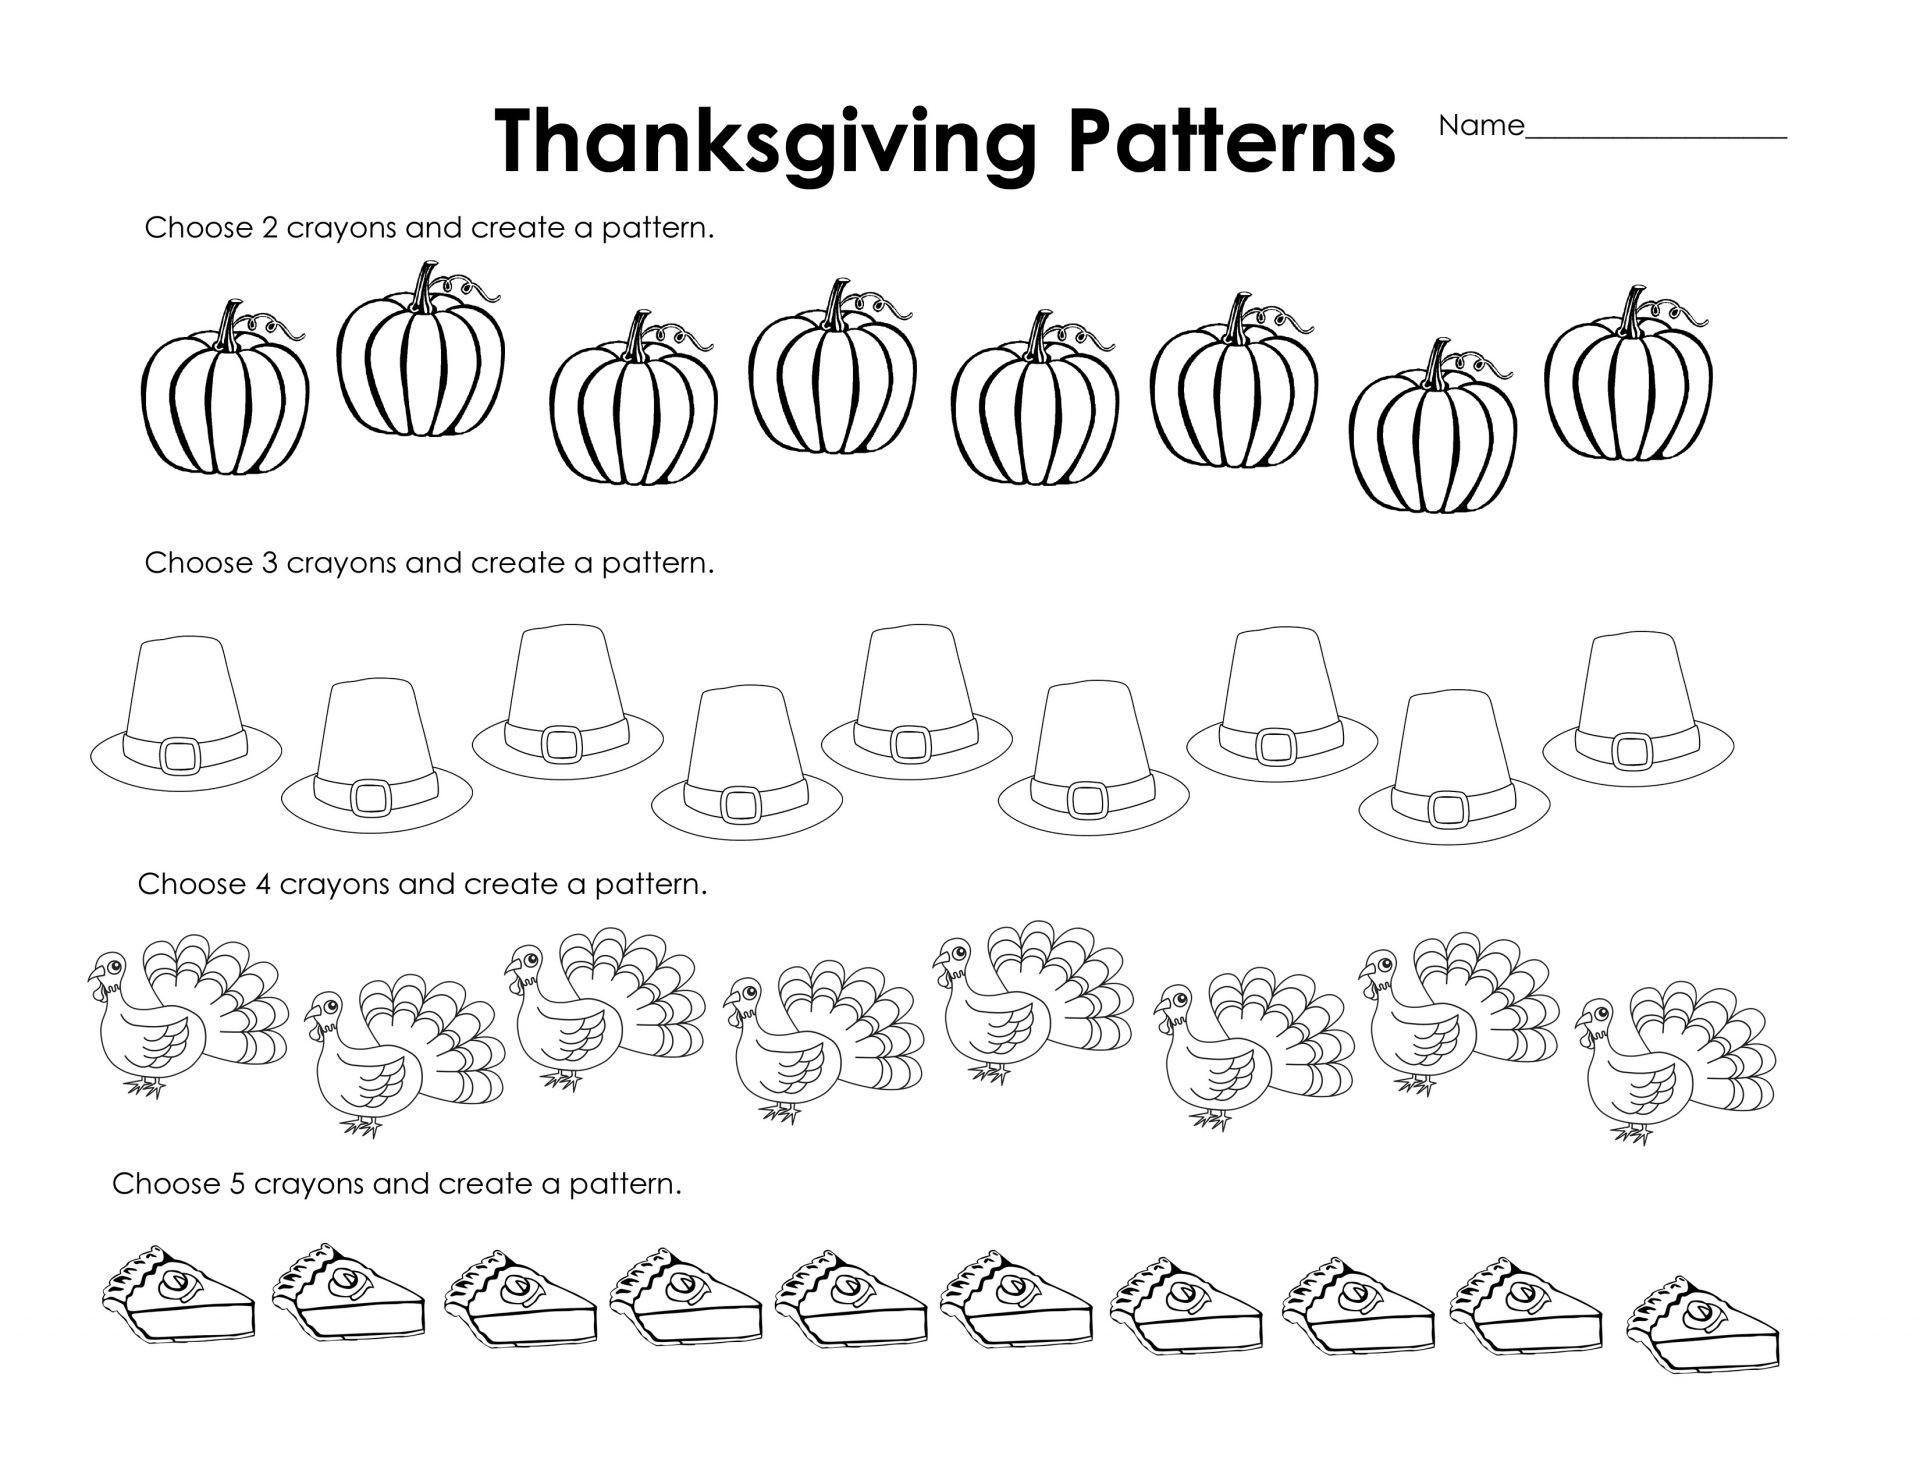 Free Printable Thanksgiving Math Worksheets – Worksheet Template - Free Printable Thanksgiving Math Worksheets For 3Rd Grade